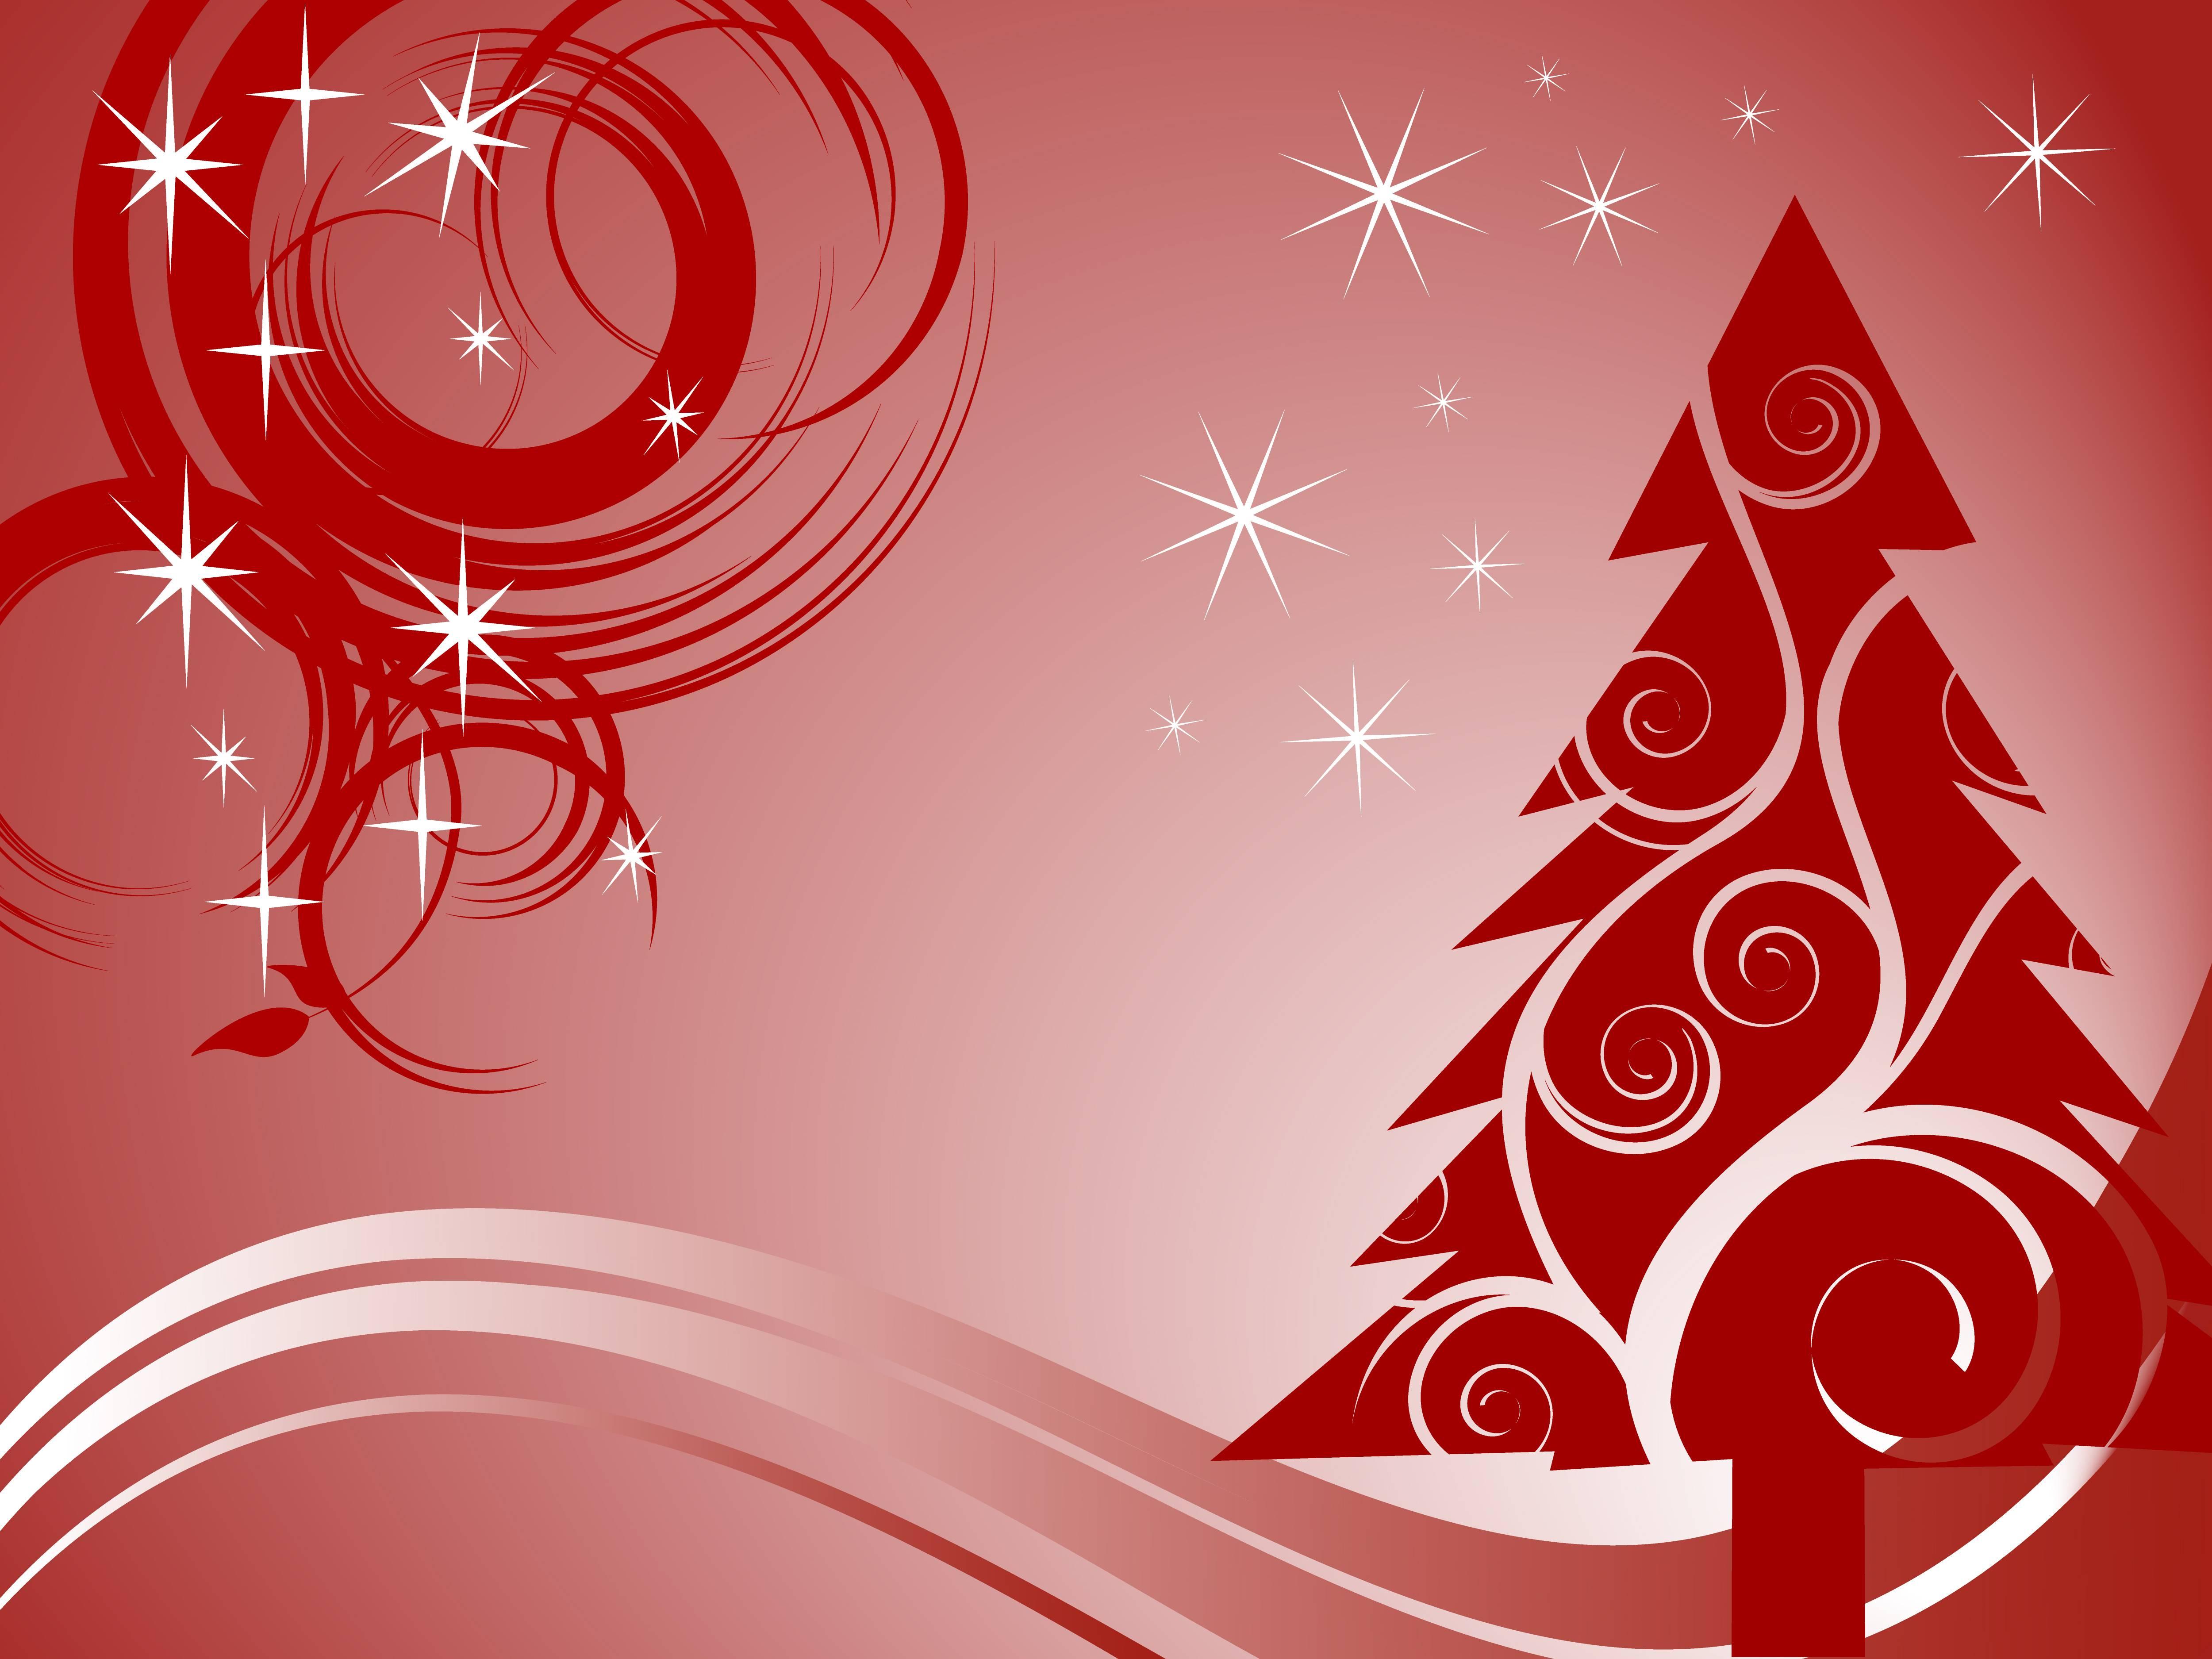 Free Christmas Background Images.Free Christmas Background Images Wallpaper Cave